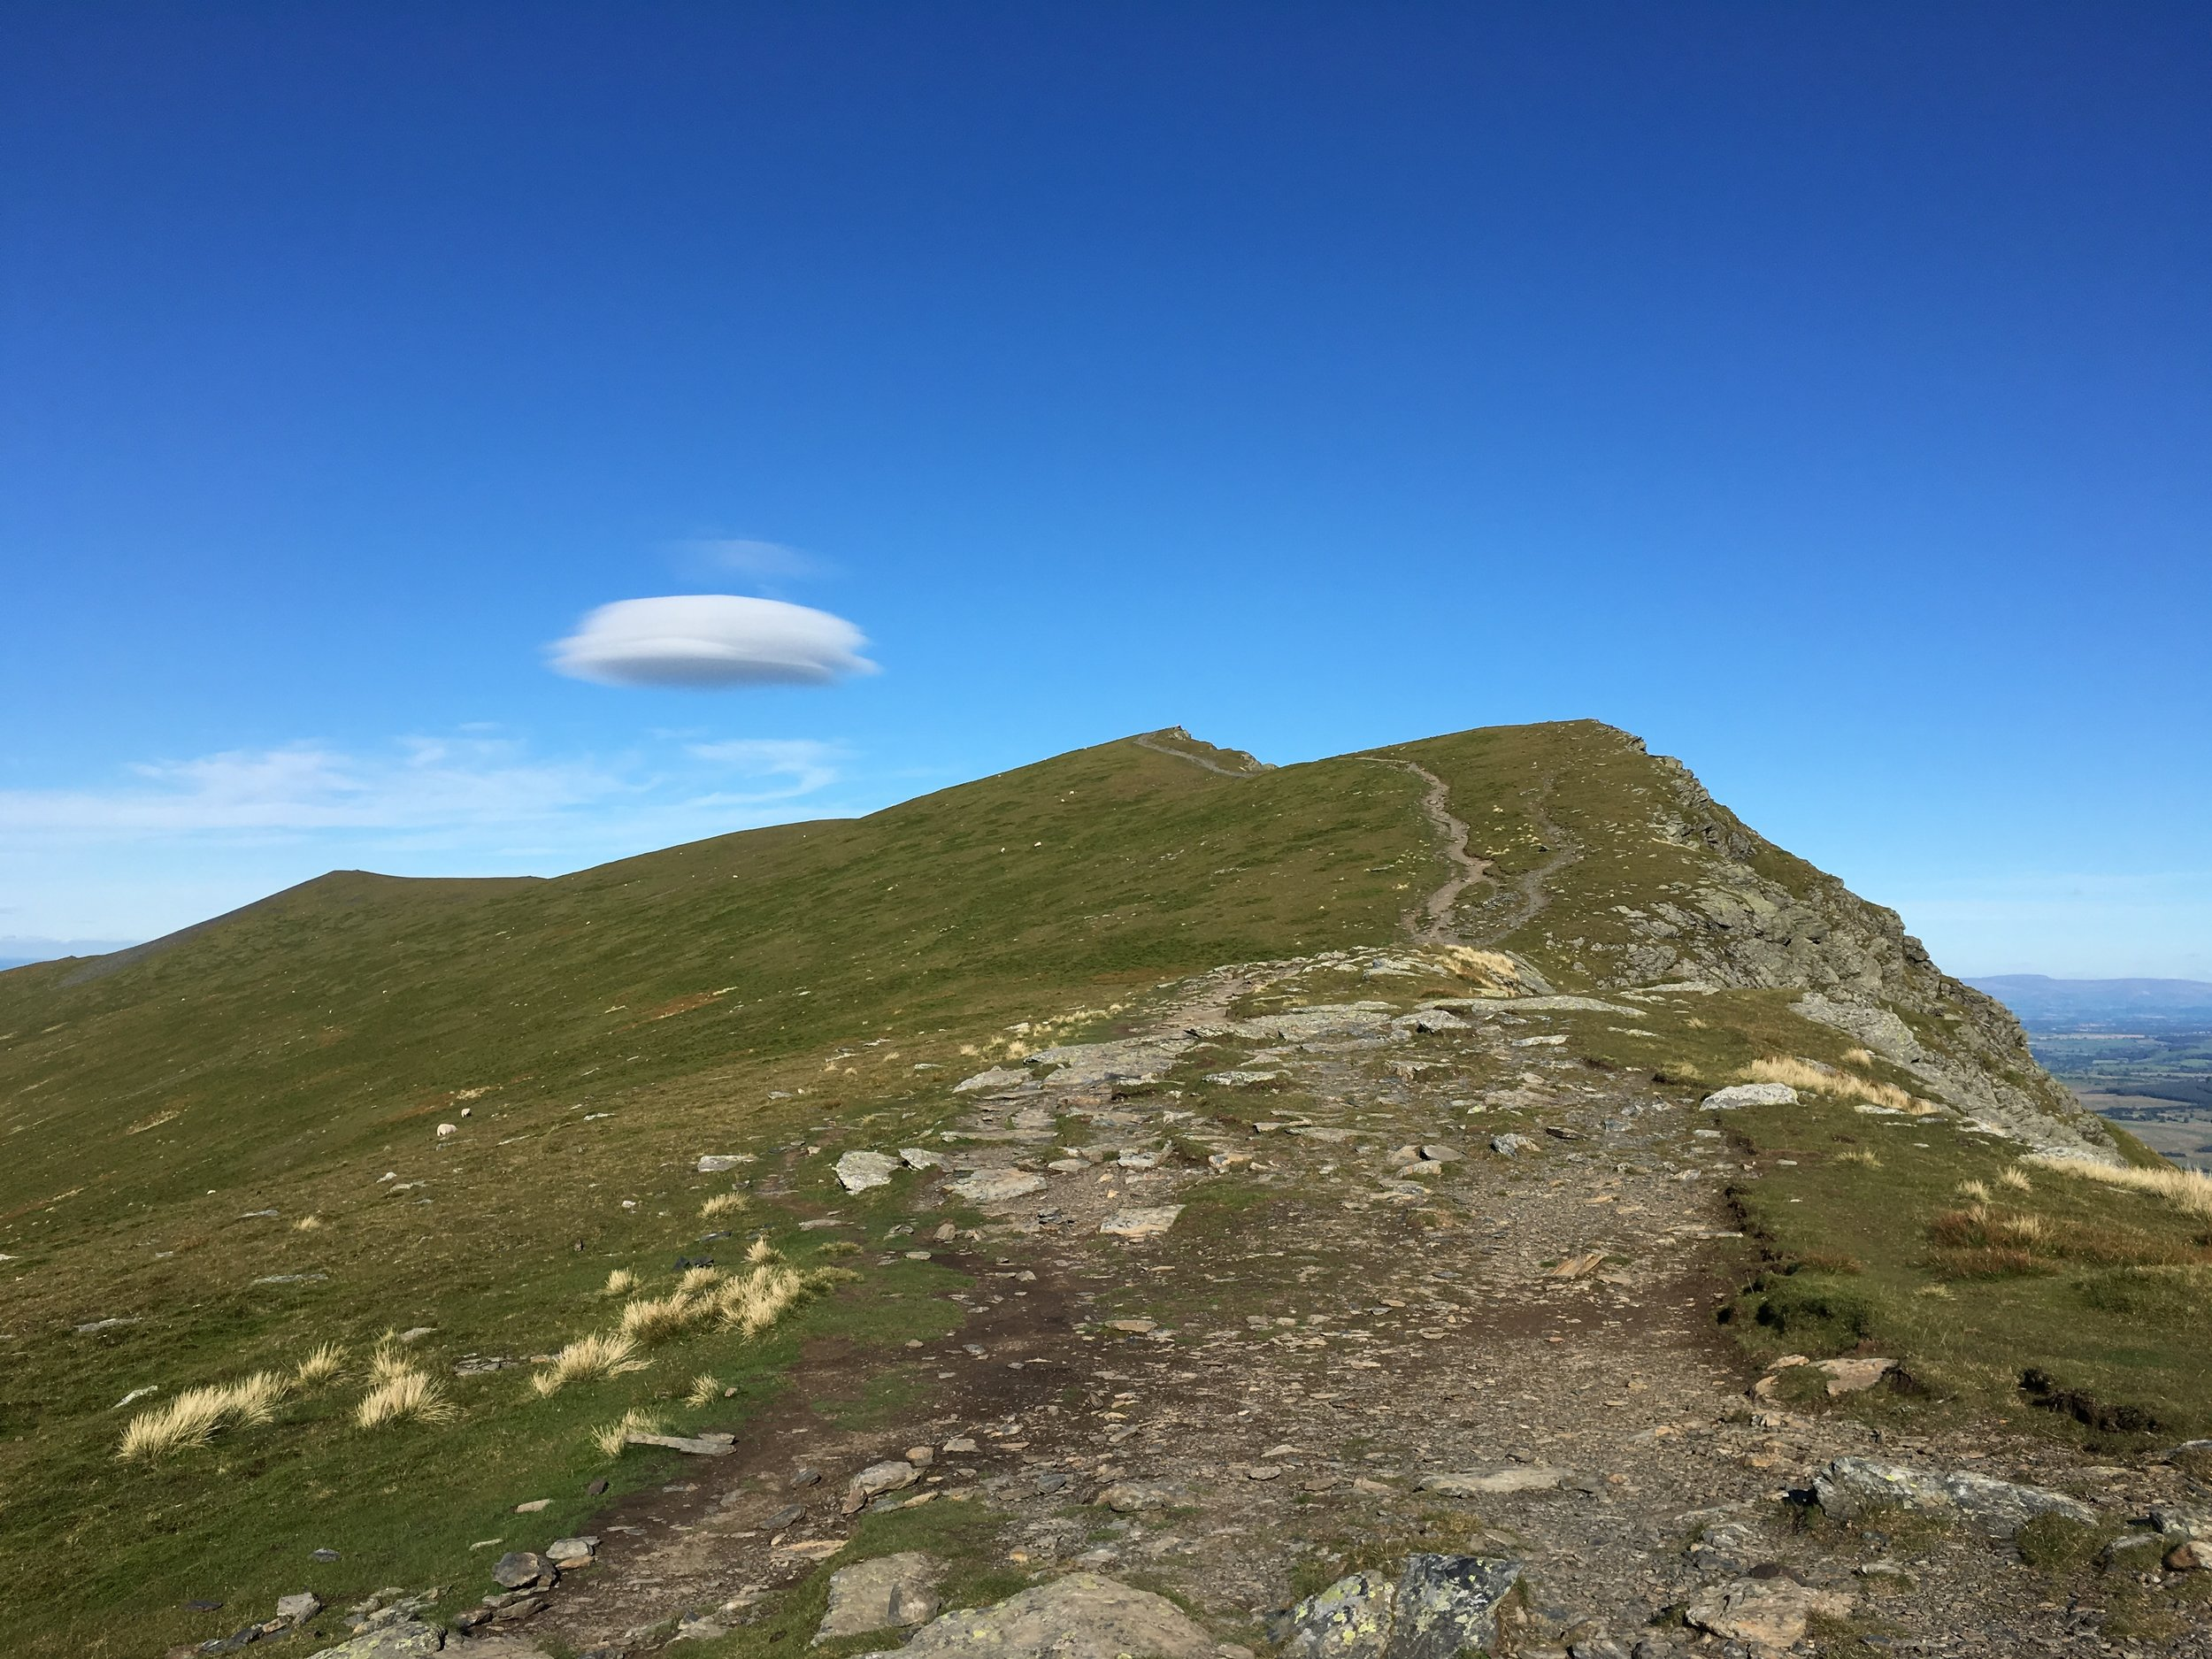 Lenticular clouds over Blencathra